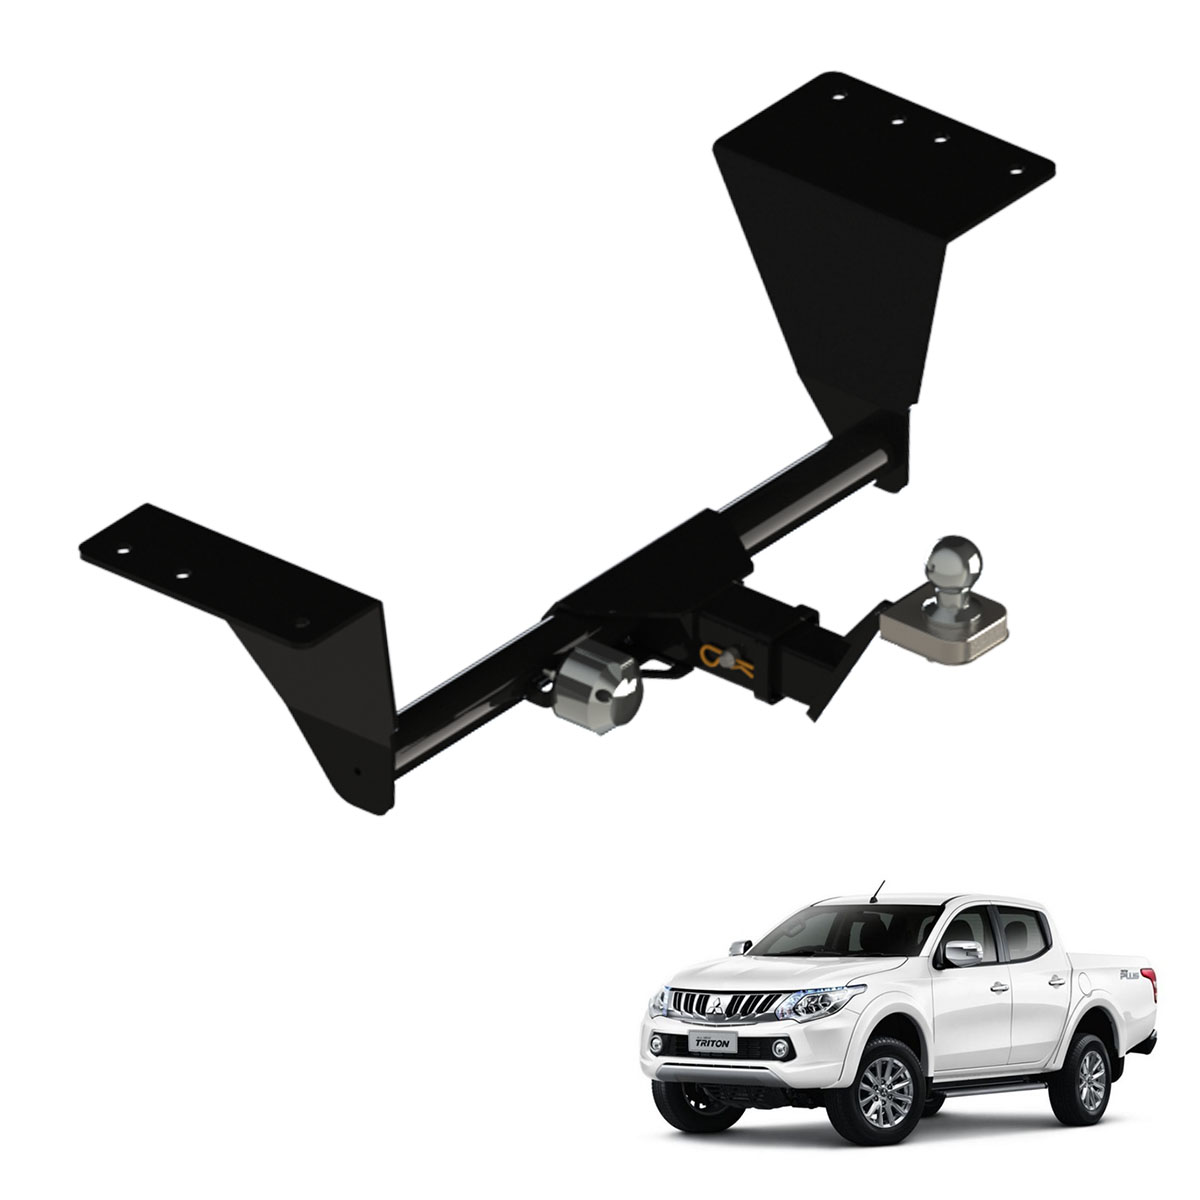 Engate de reboque Nova L200 Triton Sport 2017 removível 1500 Kg